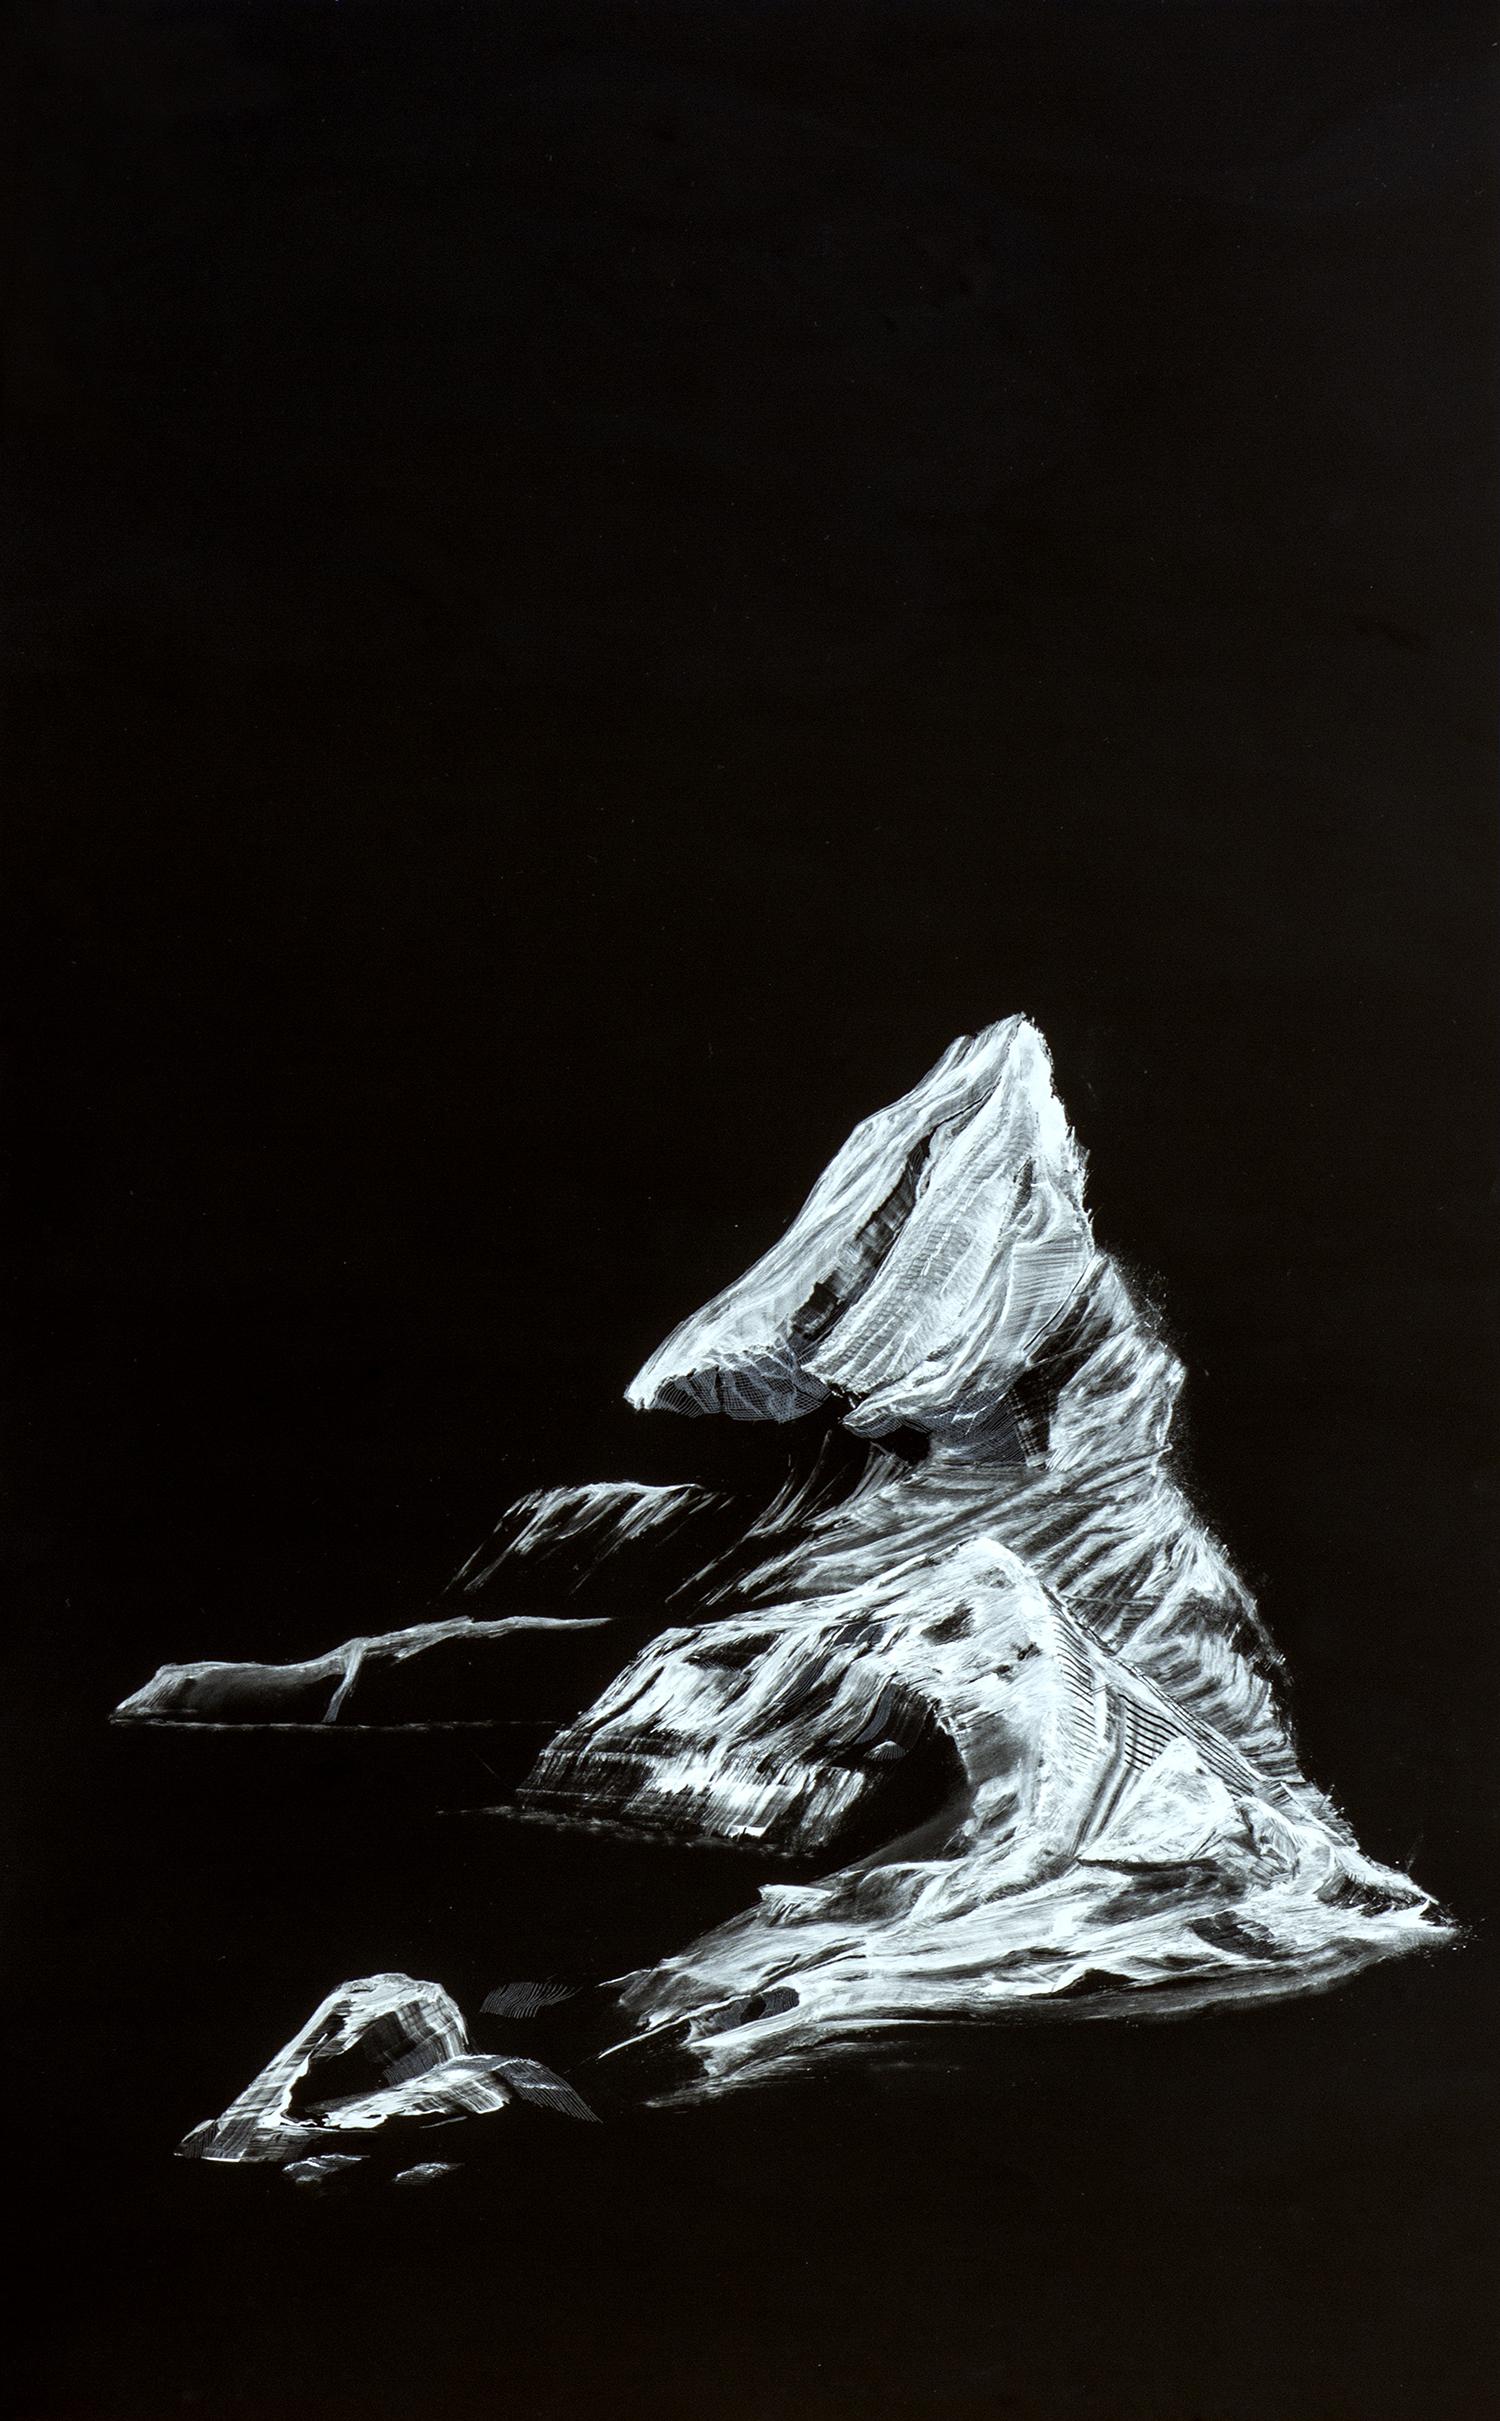 Aparece un Iceberg    Esmalte / Placa de Acrílico,100 x 60 cm, 2015     An Iceberg Appears   Ennamel / Acrylic Plaque, 3' 3.3'' x 1' 11.6'', 2015